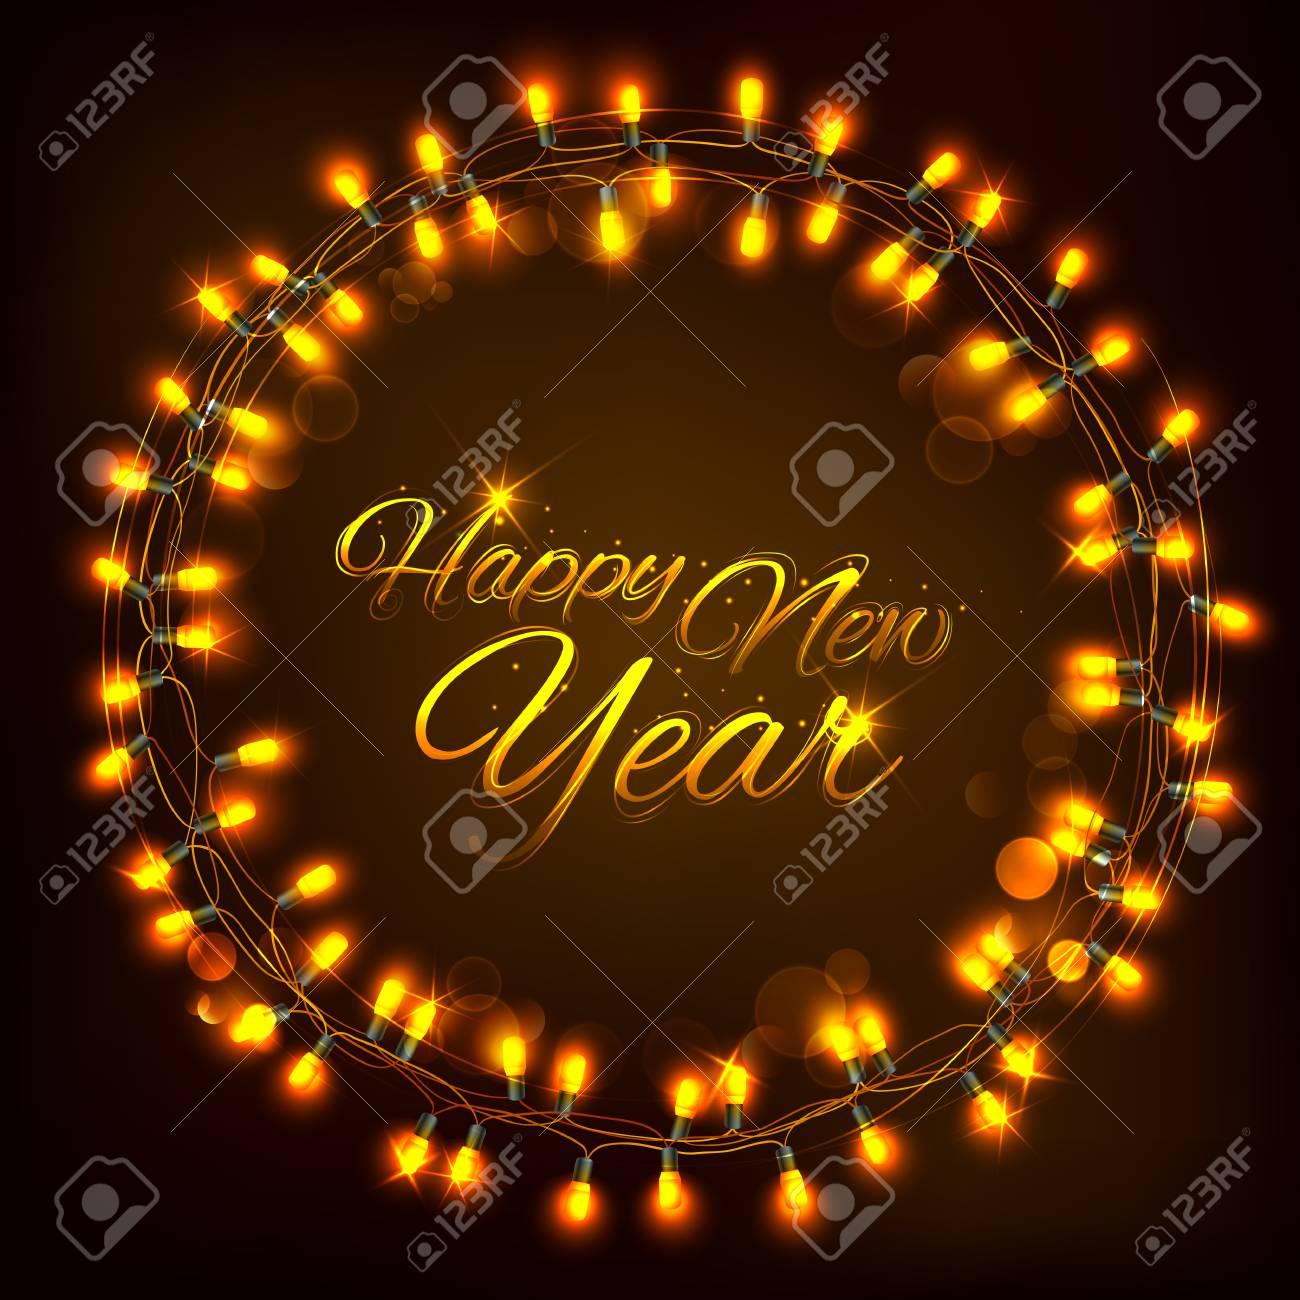 Illustration of happy new year celebration abstract seasons illustration of happy new year celebration abstract seasons greetings background with light garland stock vector m4hsunfo